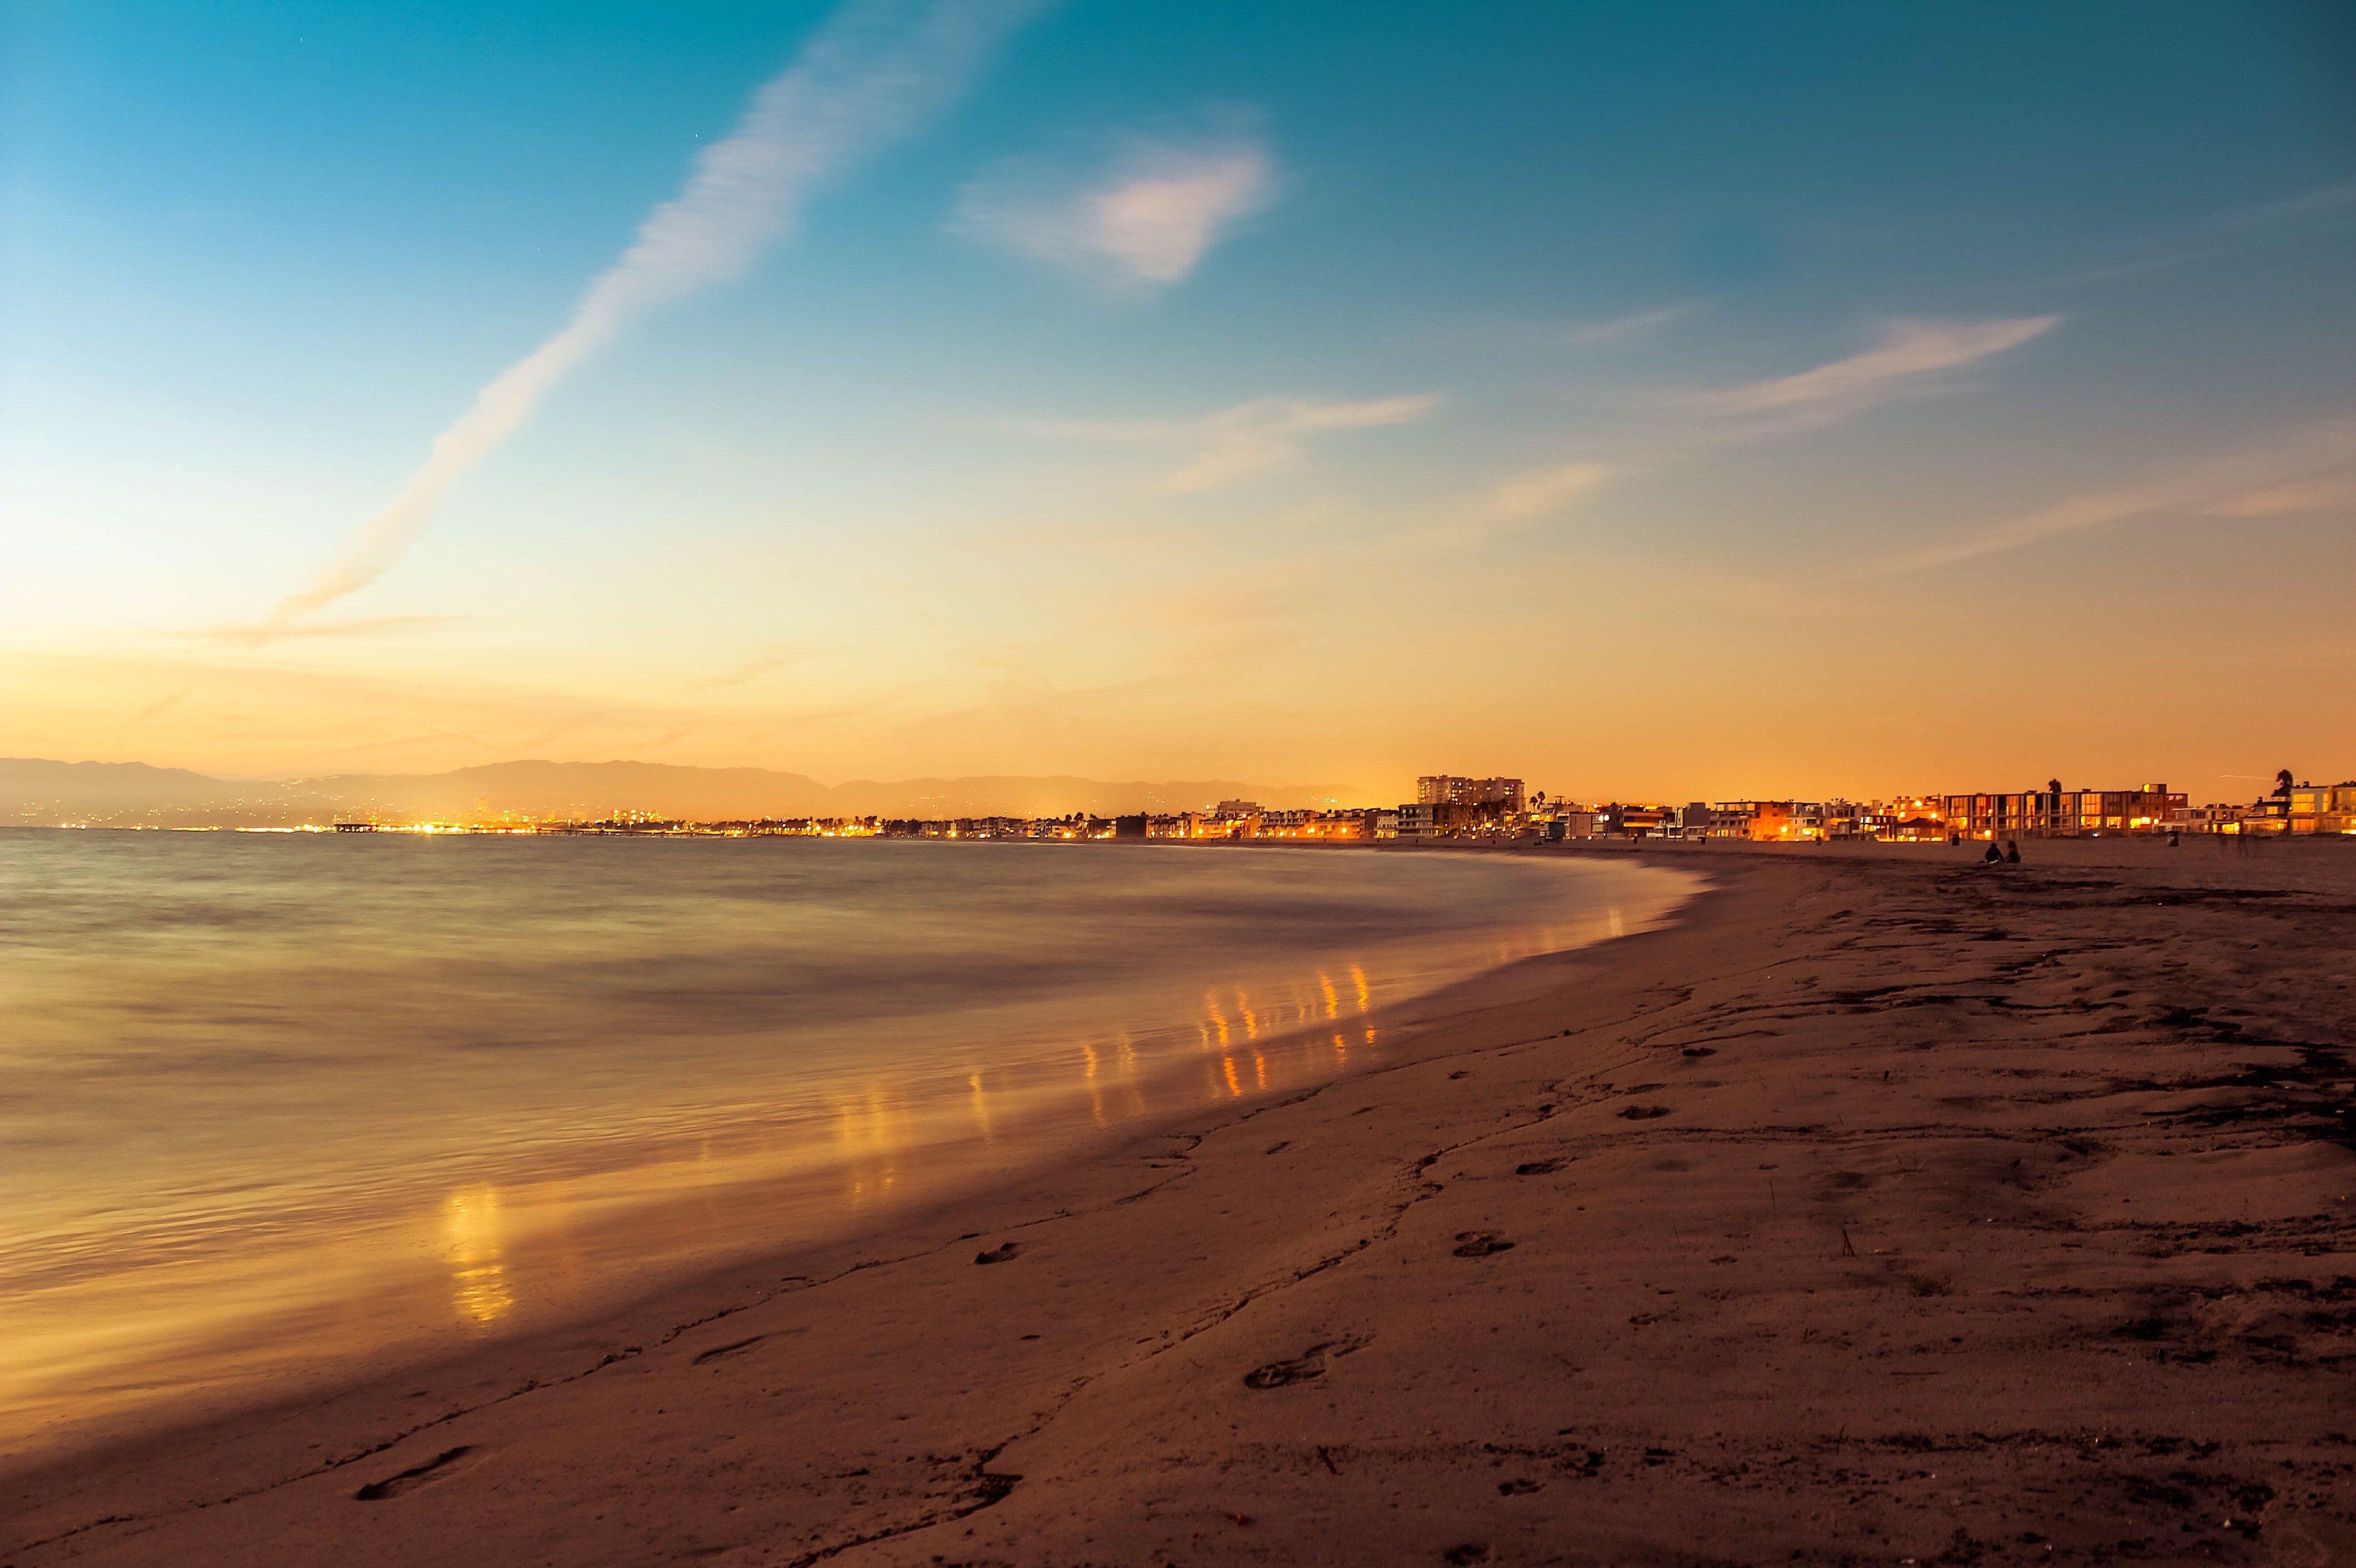 download image venice beach - photo #29